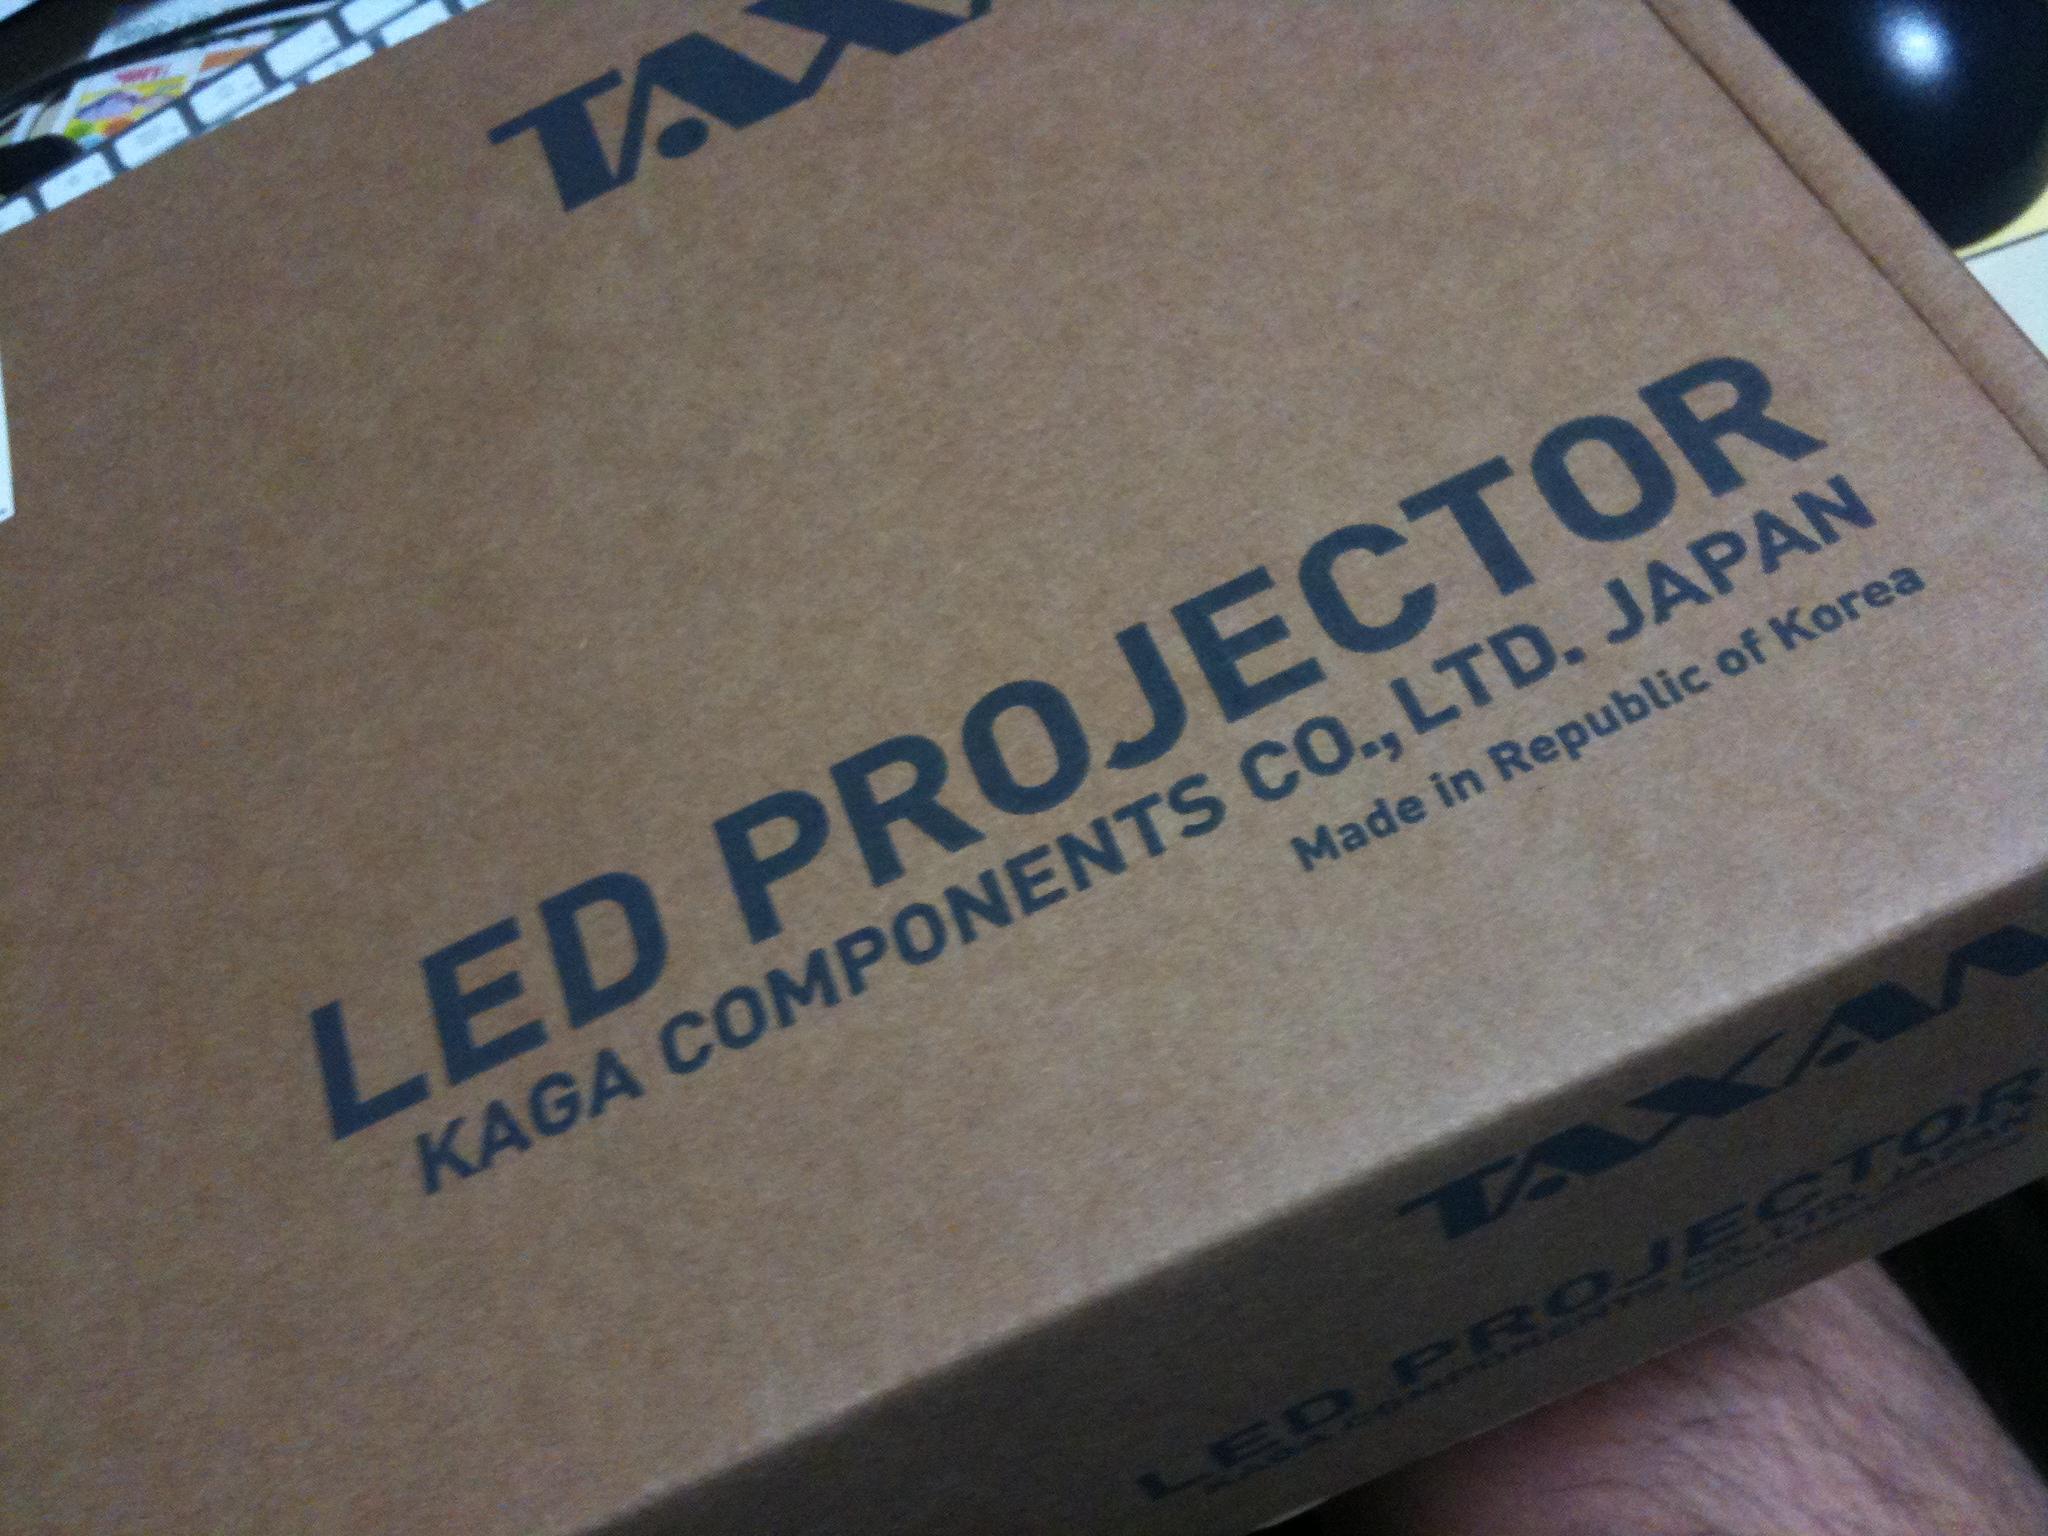 KG-PL105S - 包装の段ボール。本体は韓国製らしい。KG